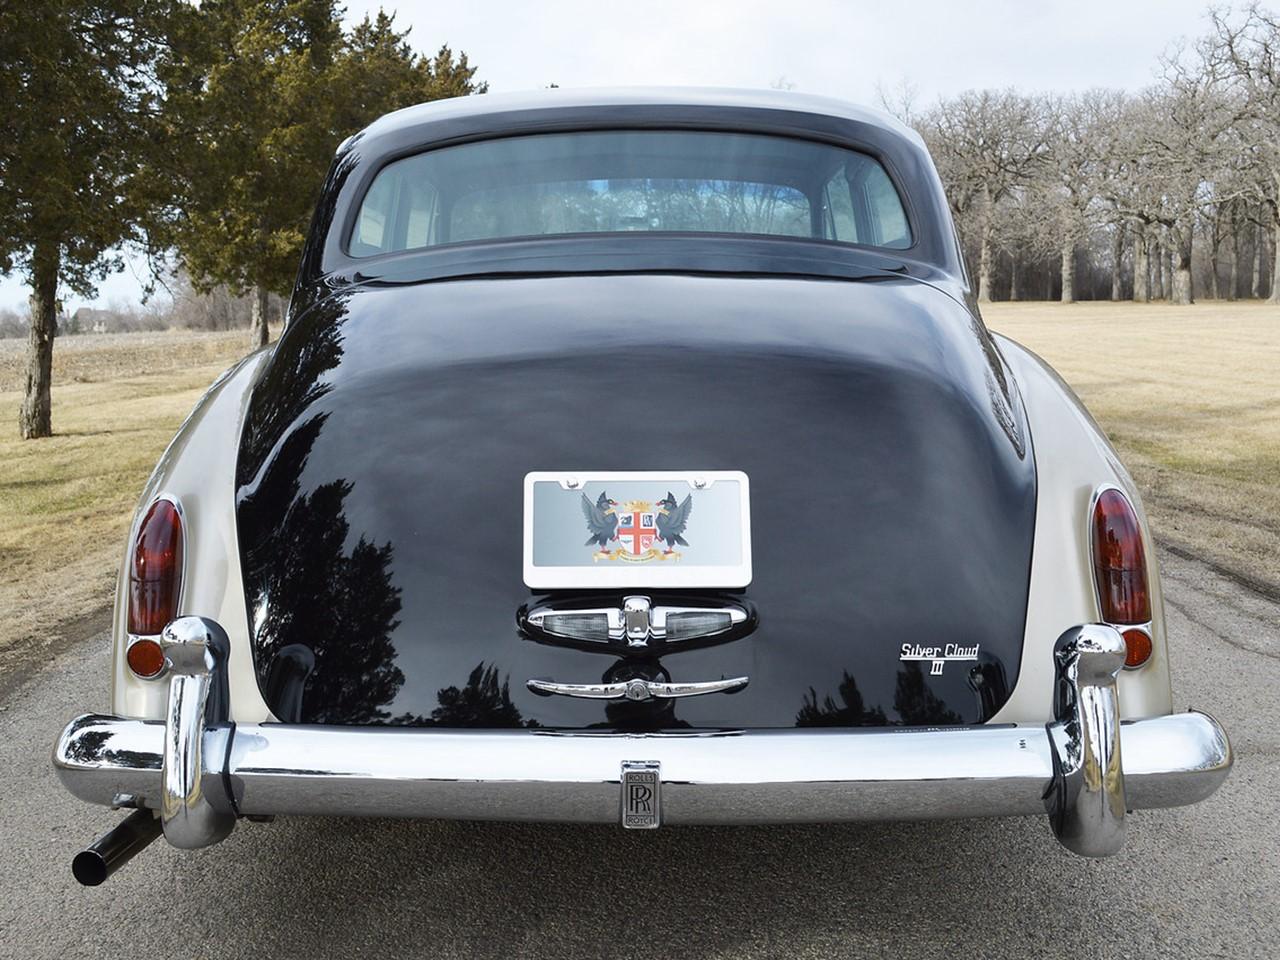 1963 Silver Cloud III 6